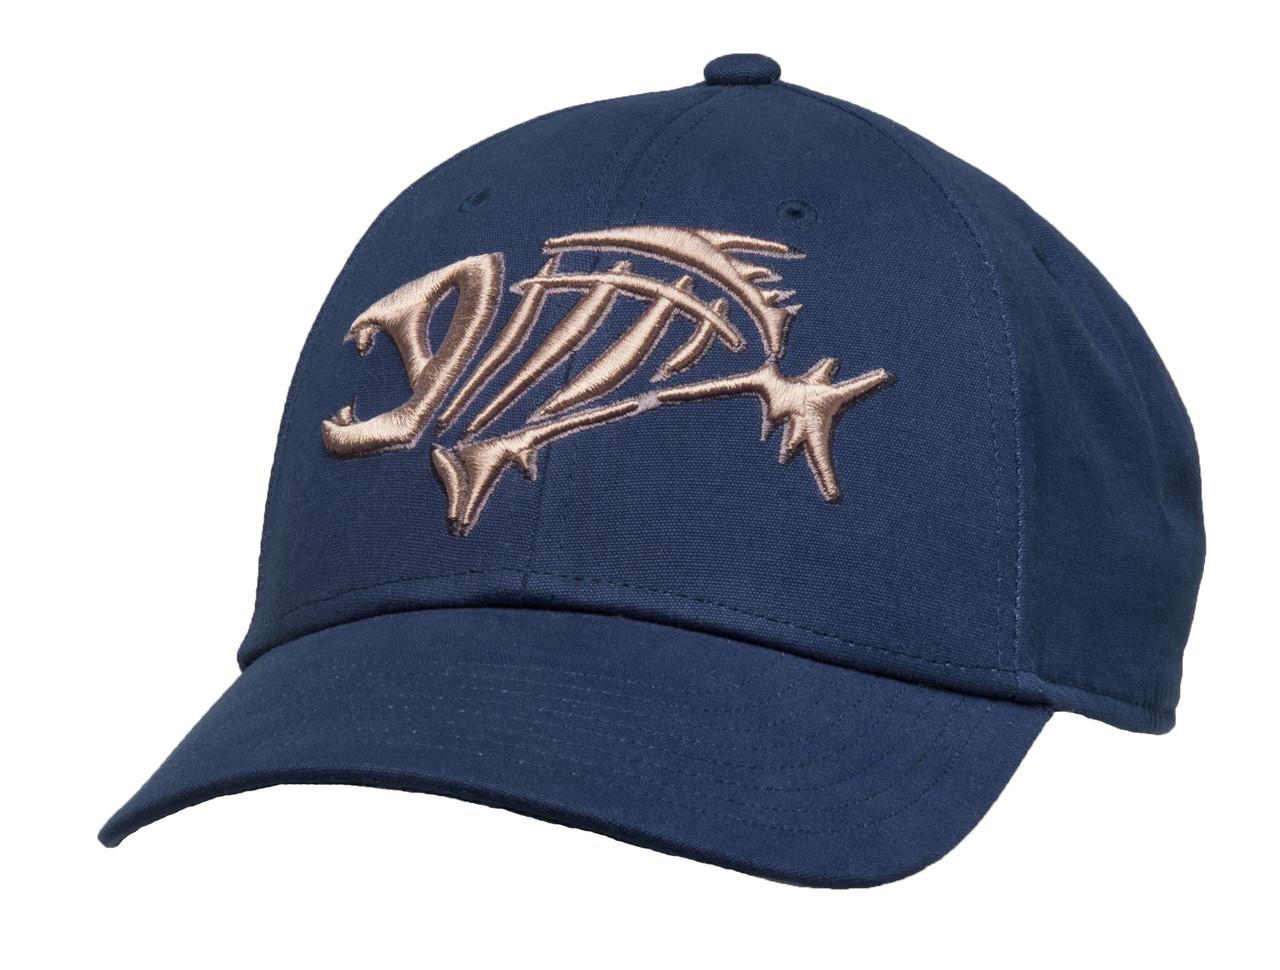 G. Loomis Grip Bill Fishing Cap